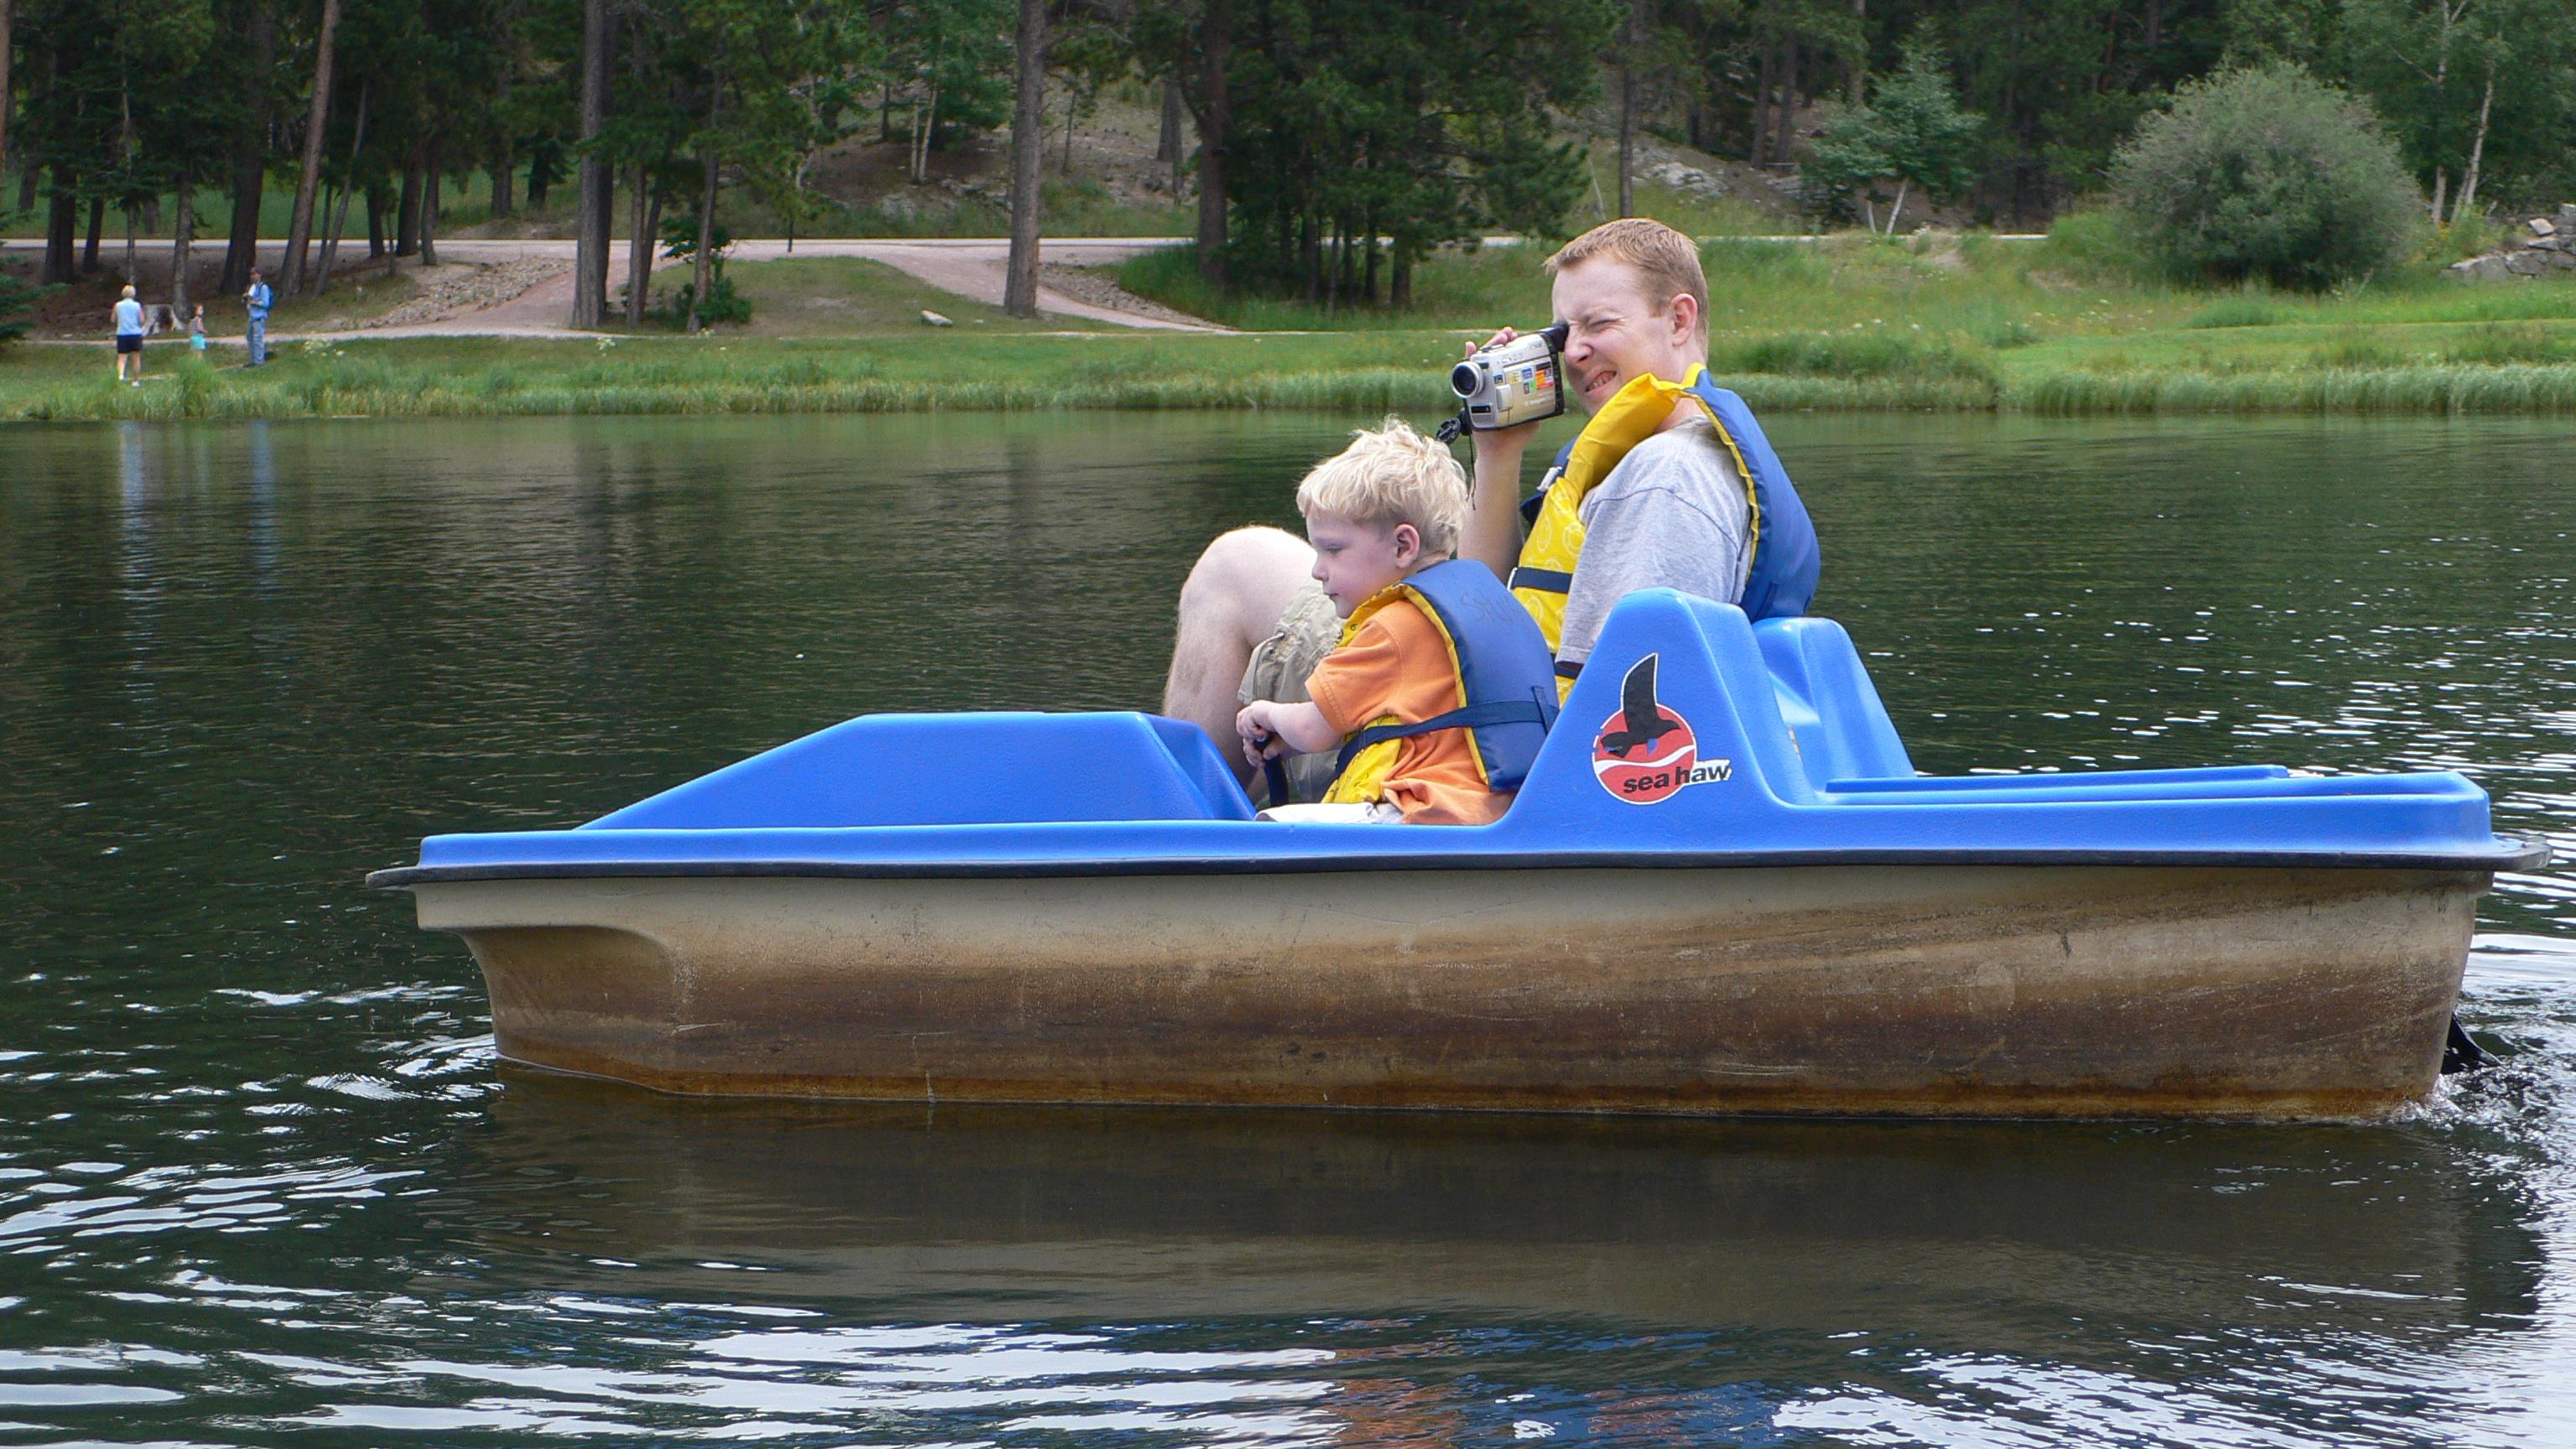 Motor Boat And Paddle Boat Rentals  Placid Boat Rentals